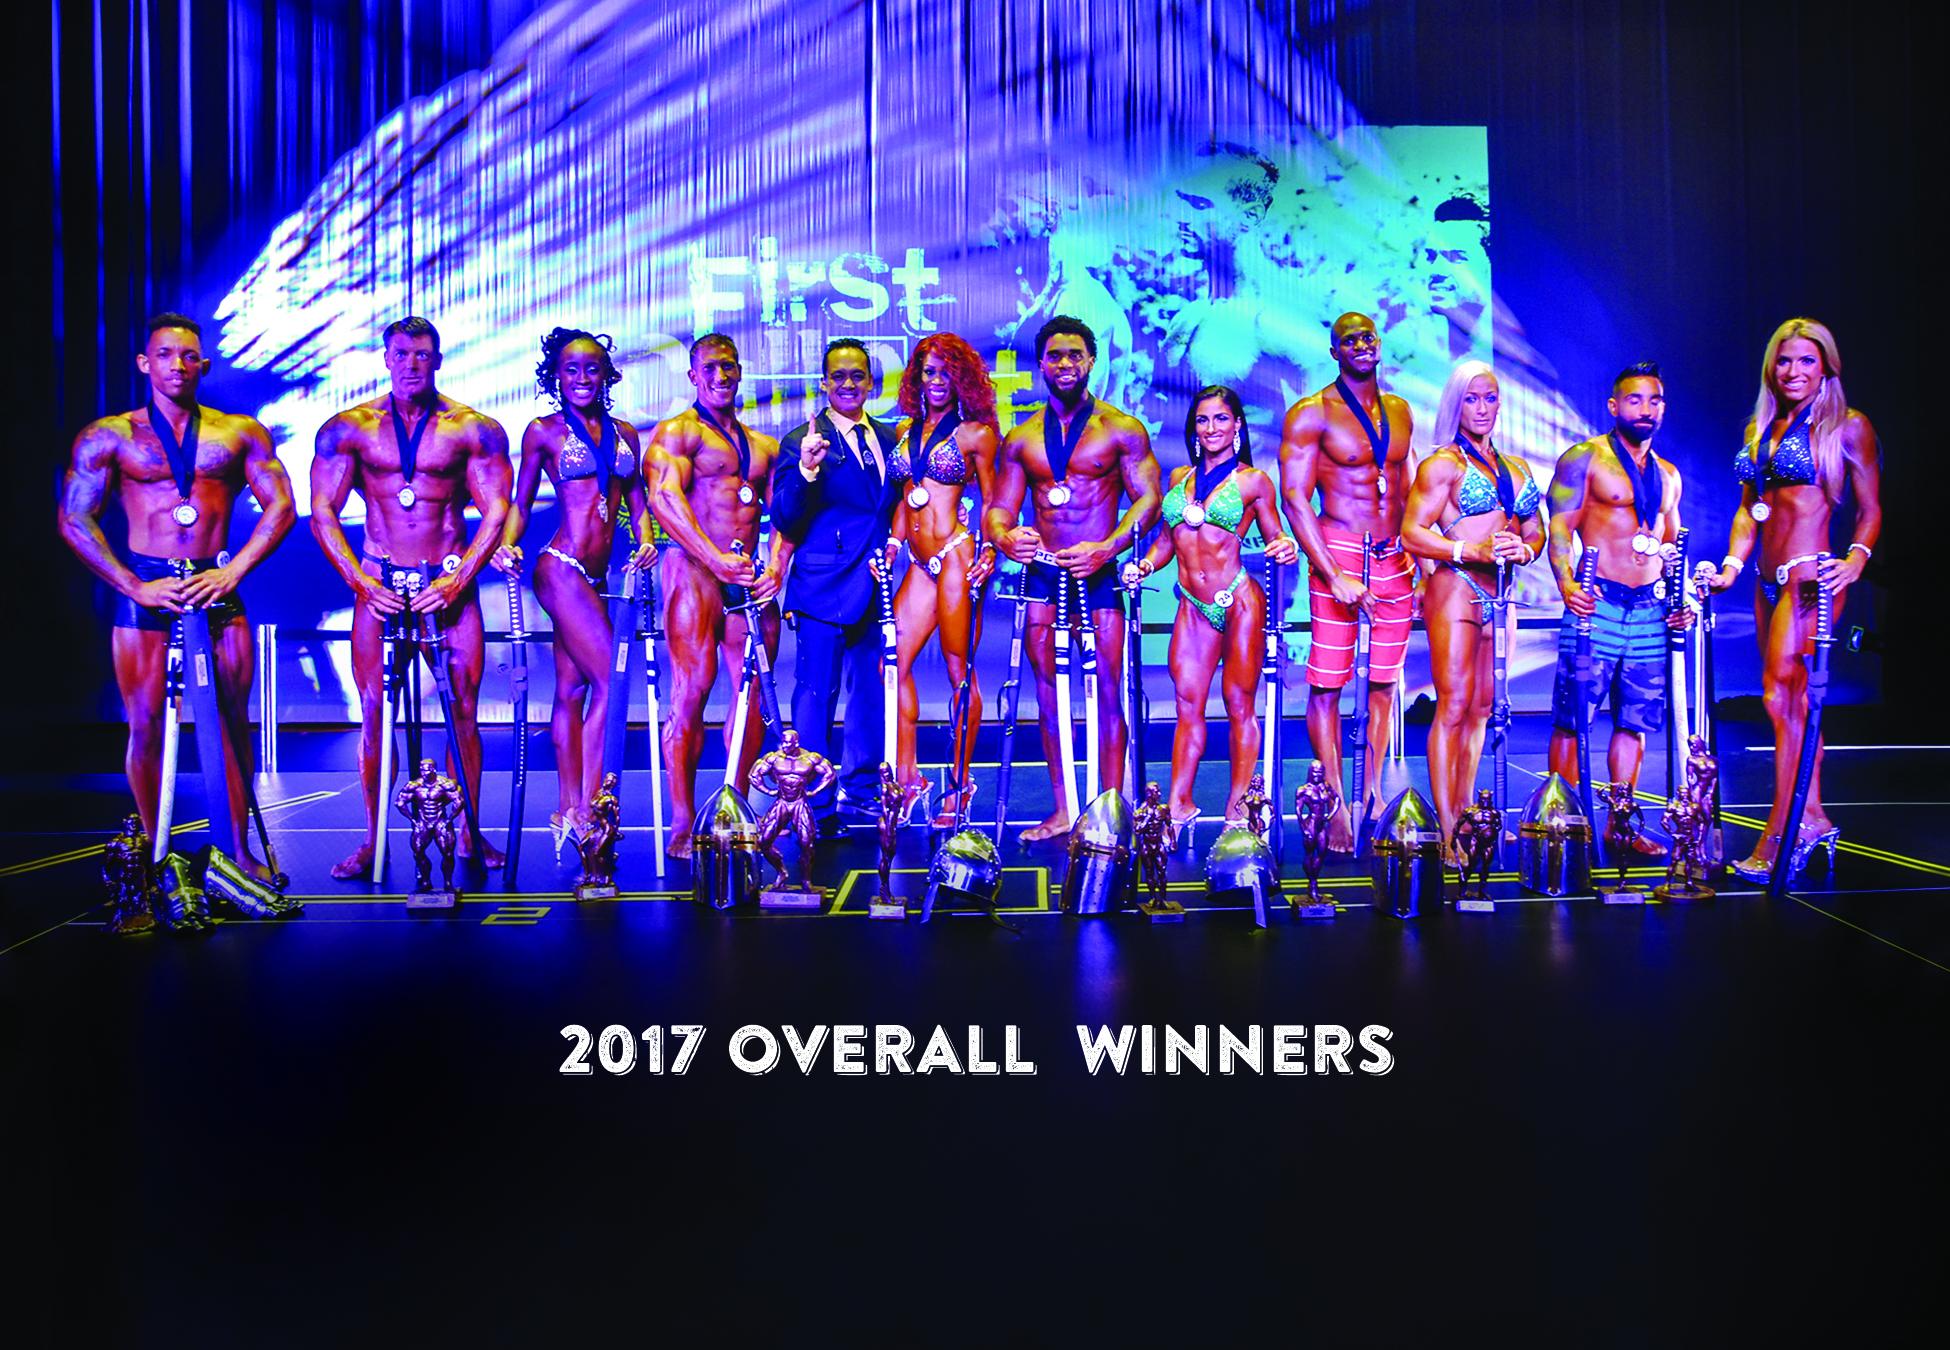 2018pic.jpg